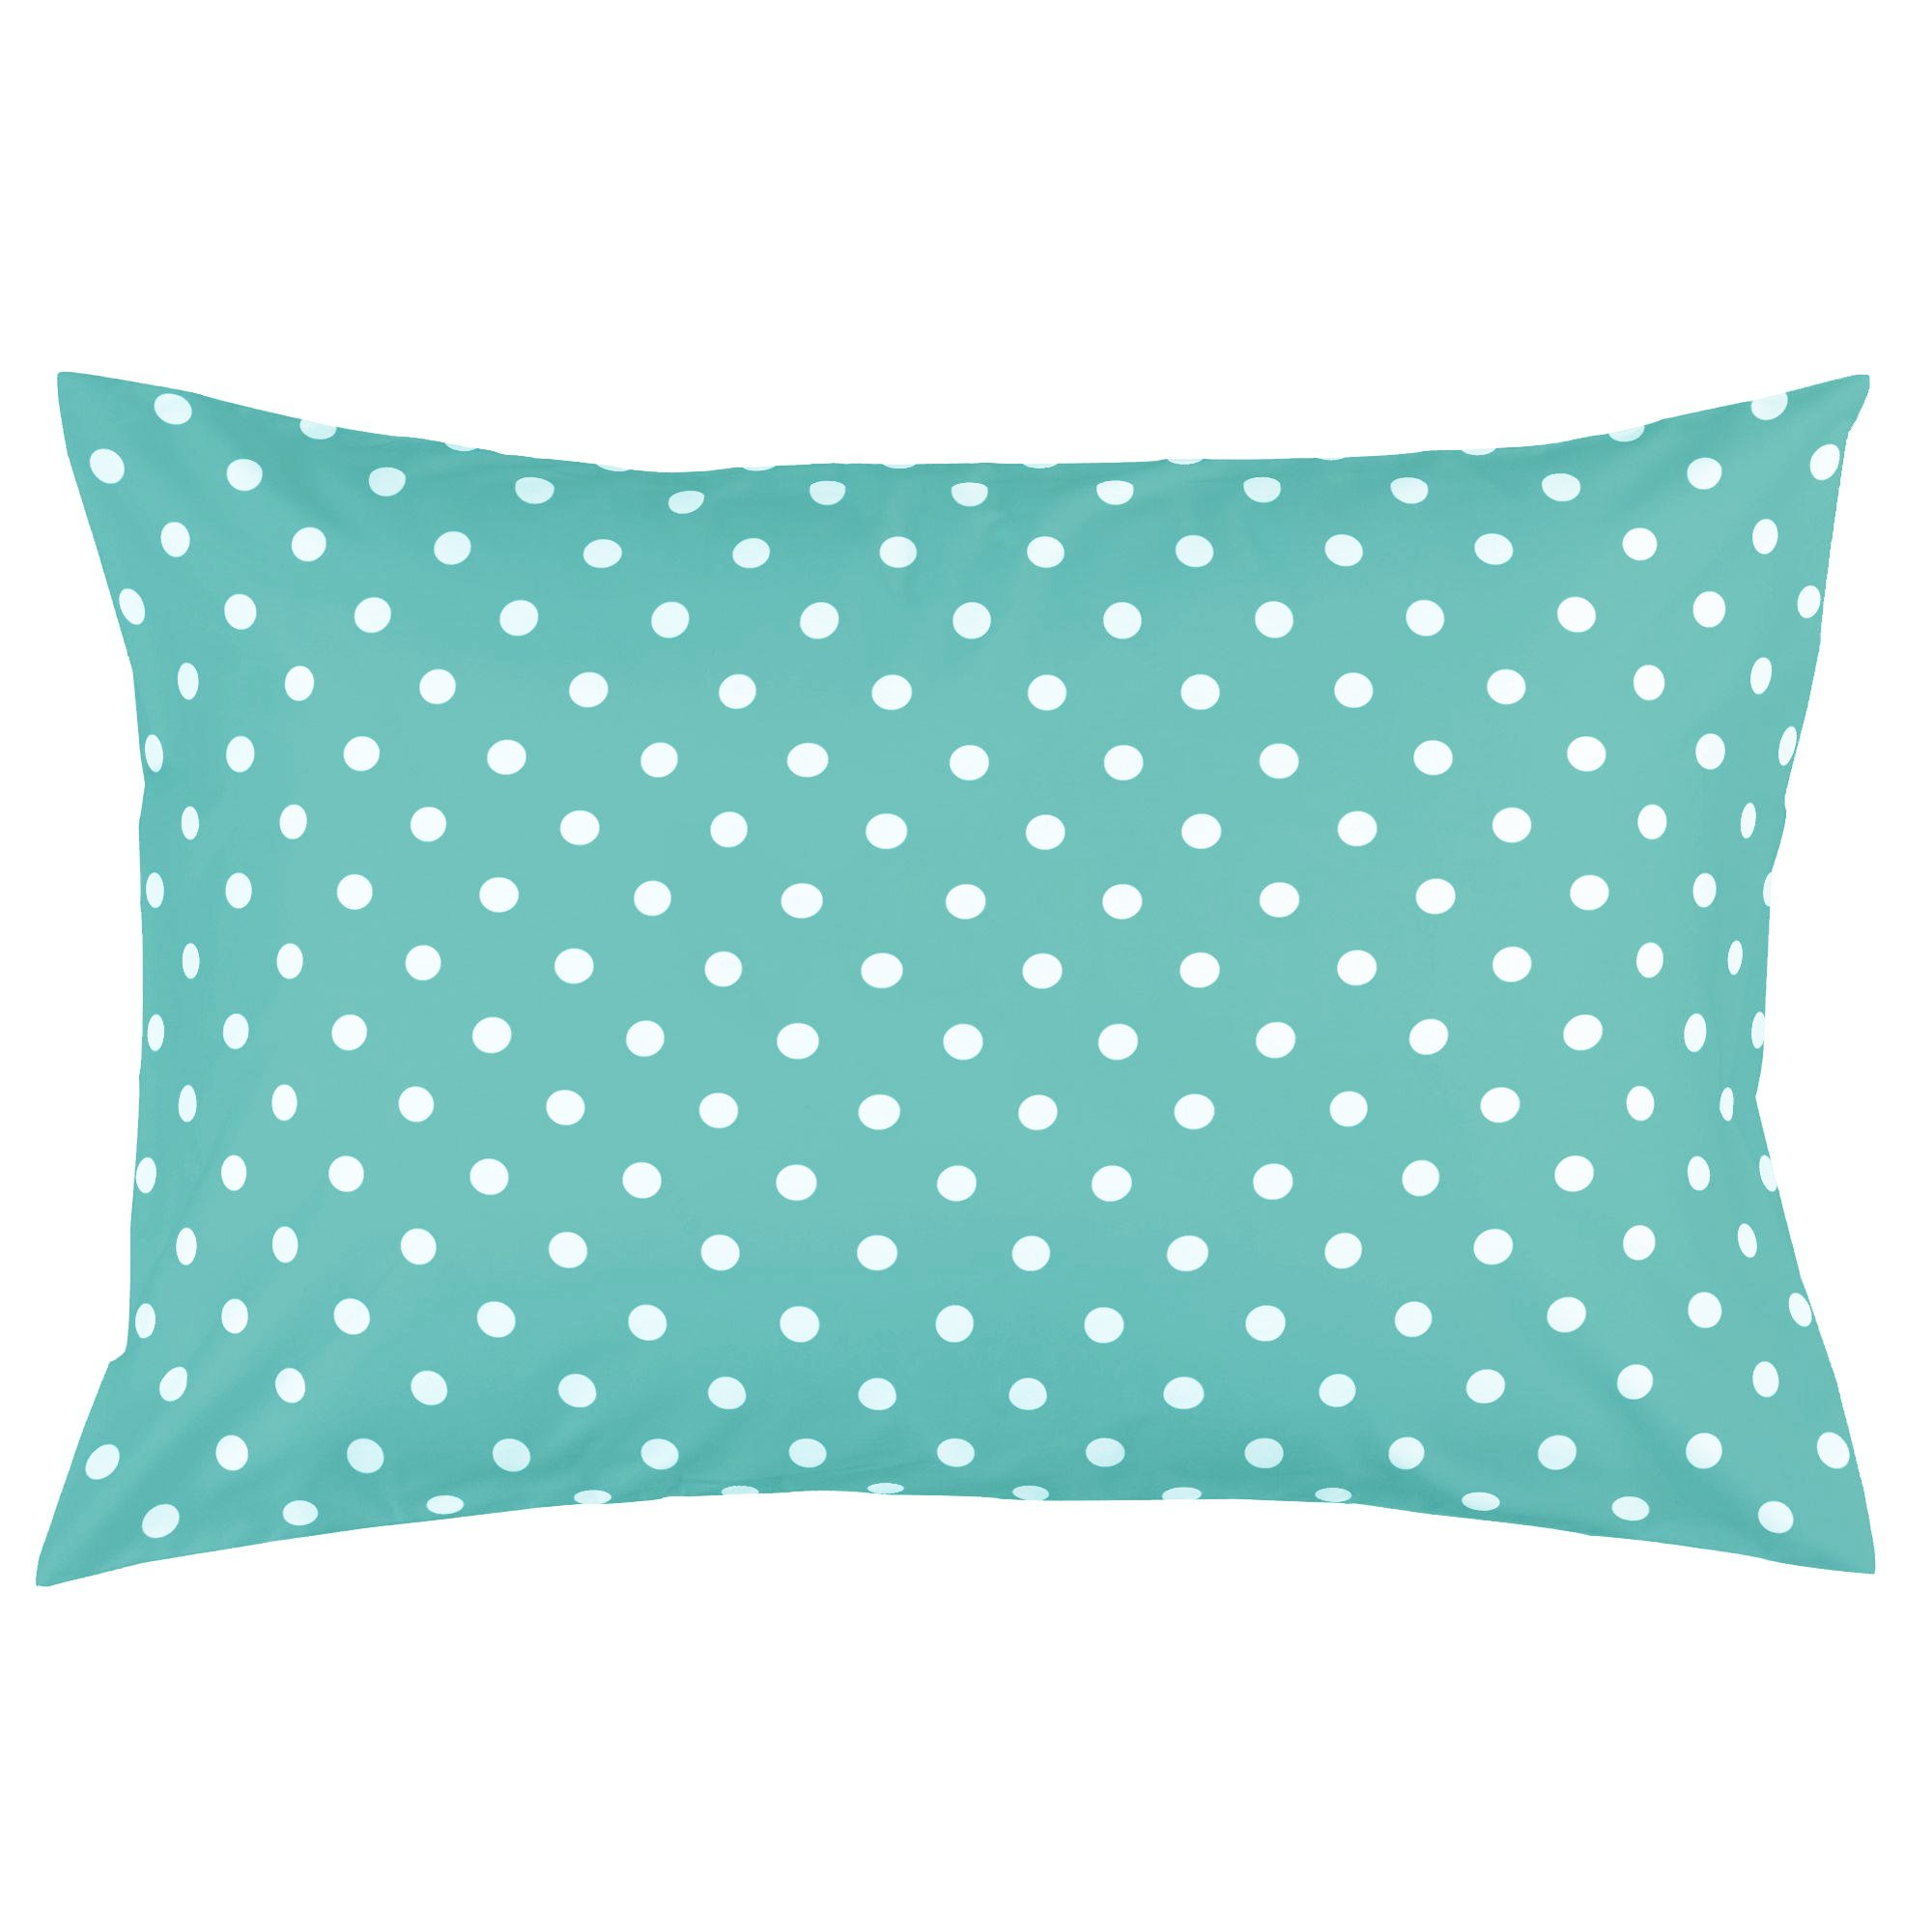 Toddler Pillowcase by Dreamtown Kids. 100% Cotton. Turquoise Polka DOT